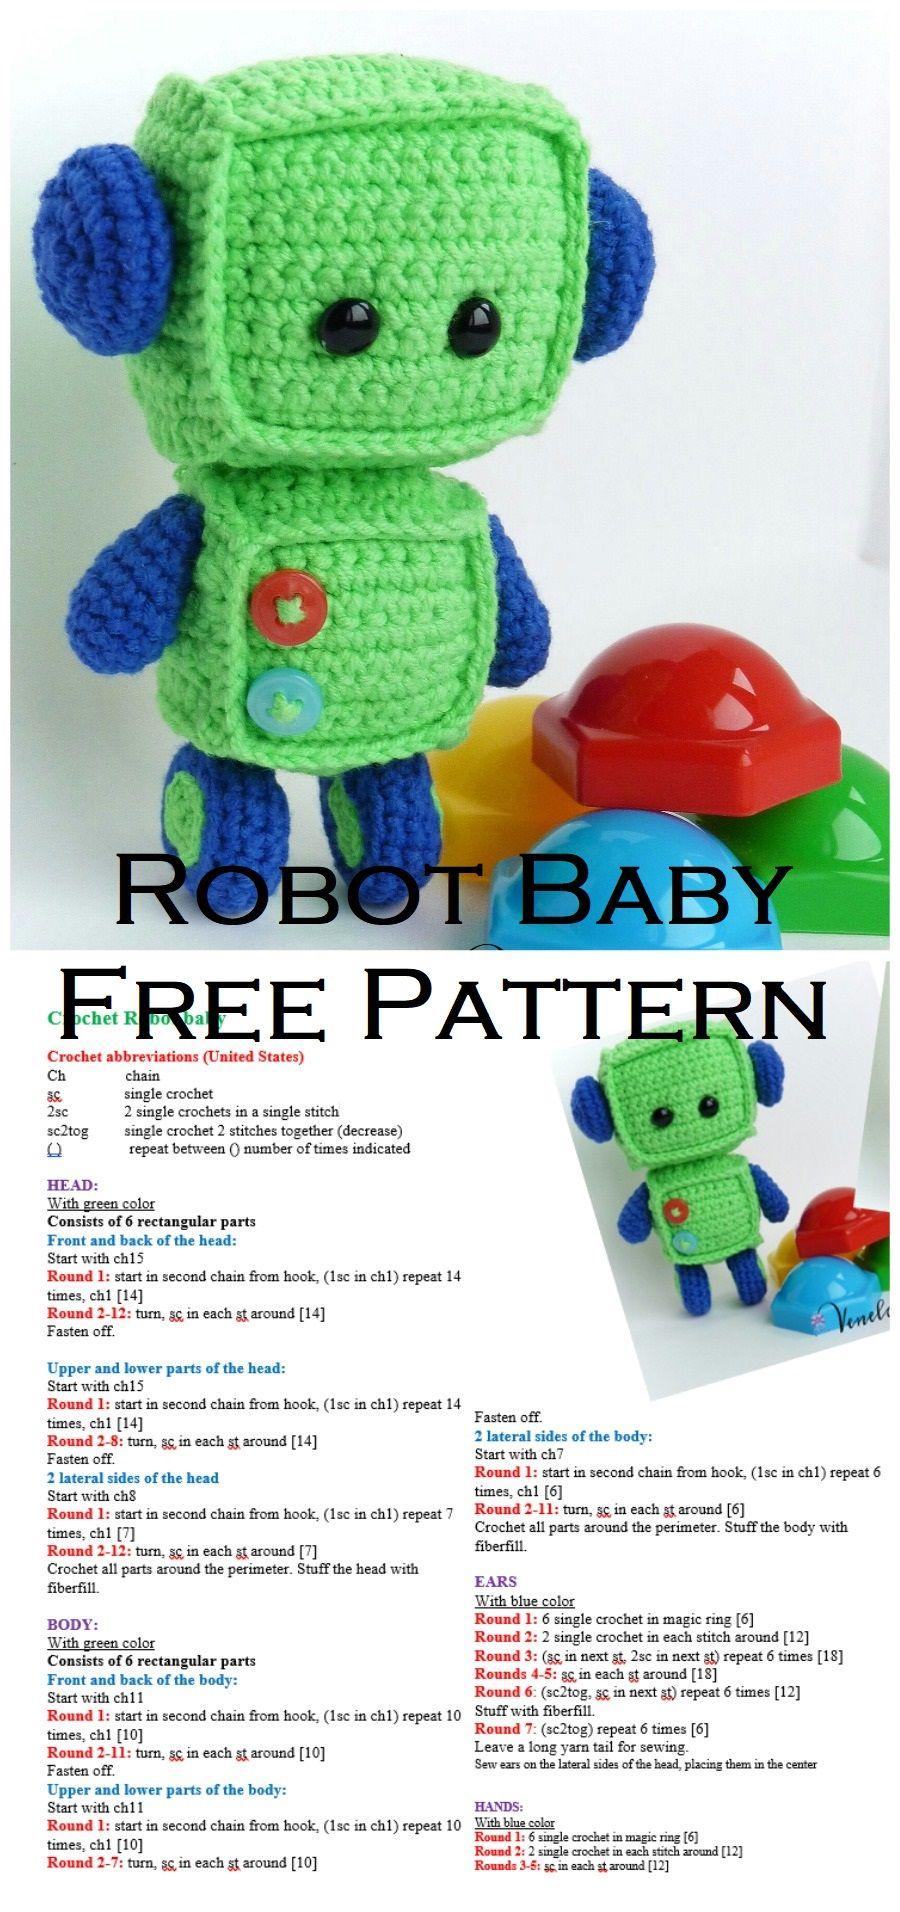 Free Crochet Sloth Amigurumi Pattern - thefriendlyredfox.com | 1912x900